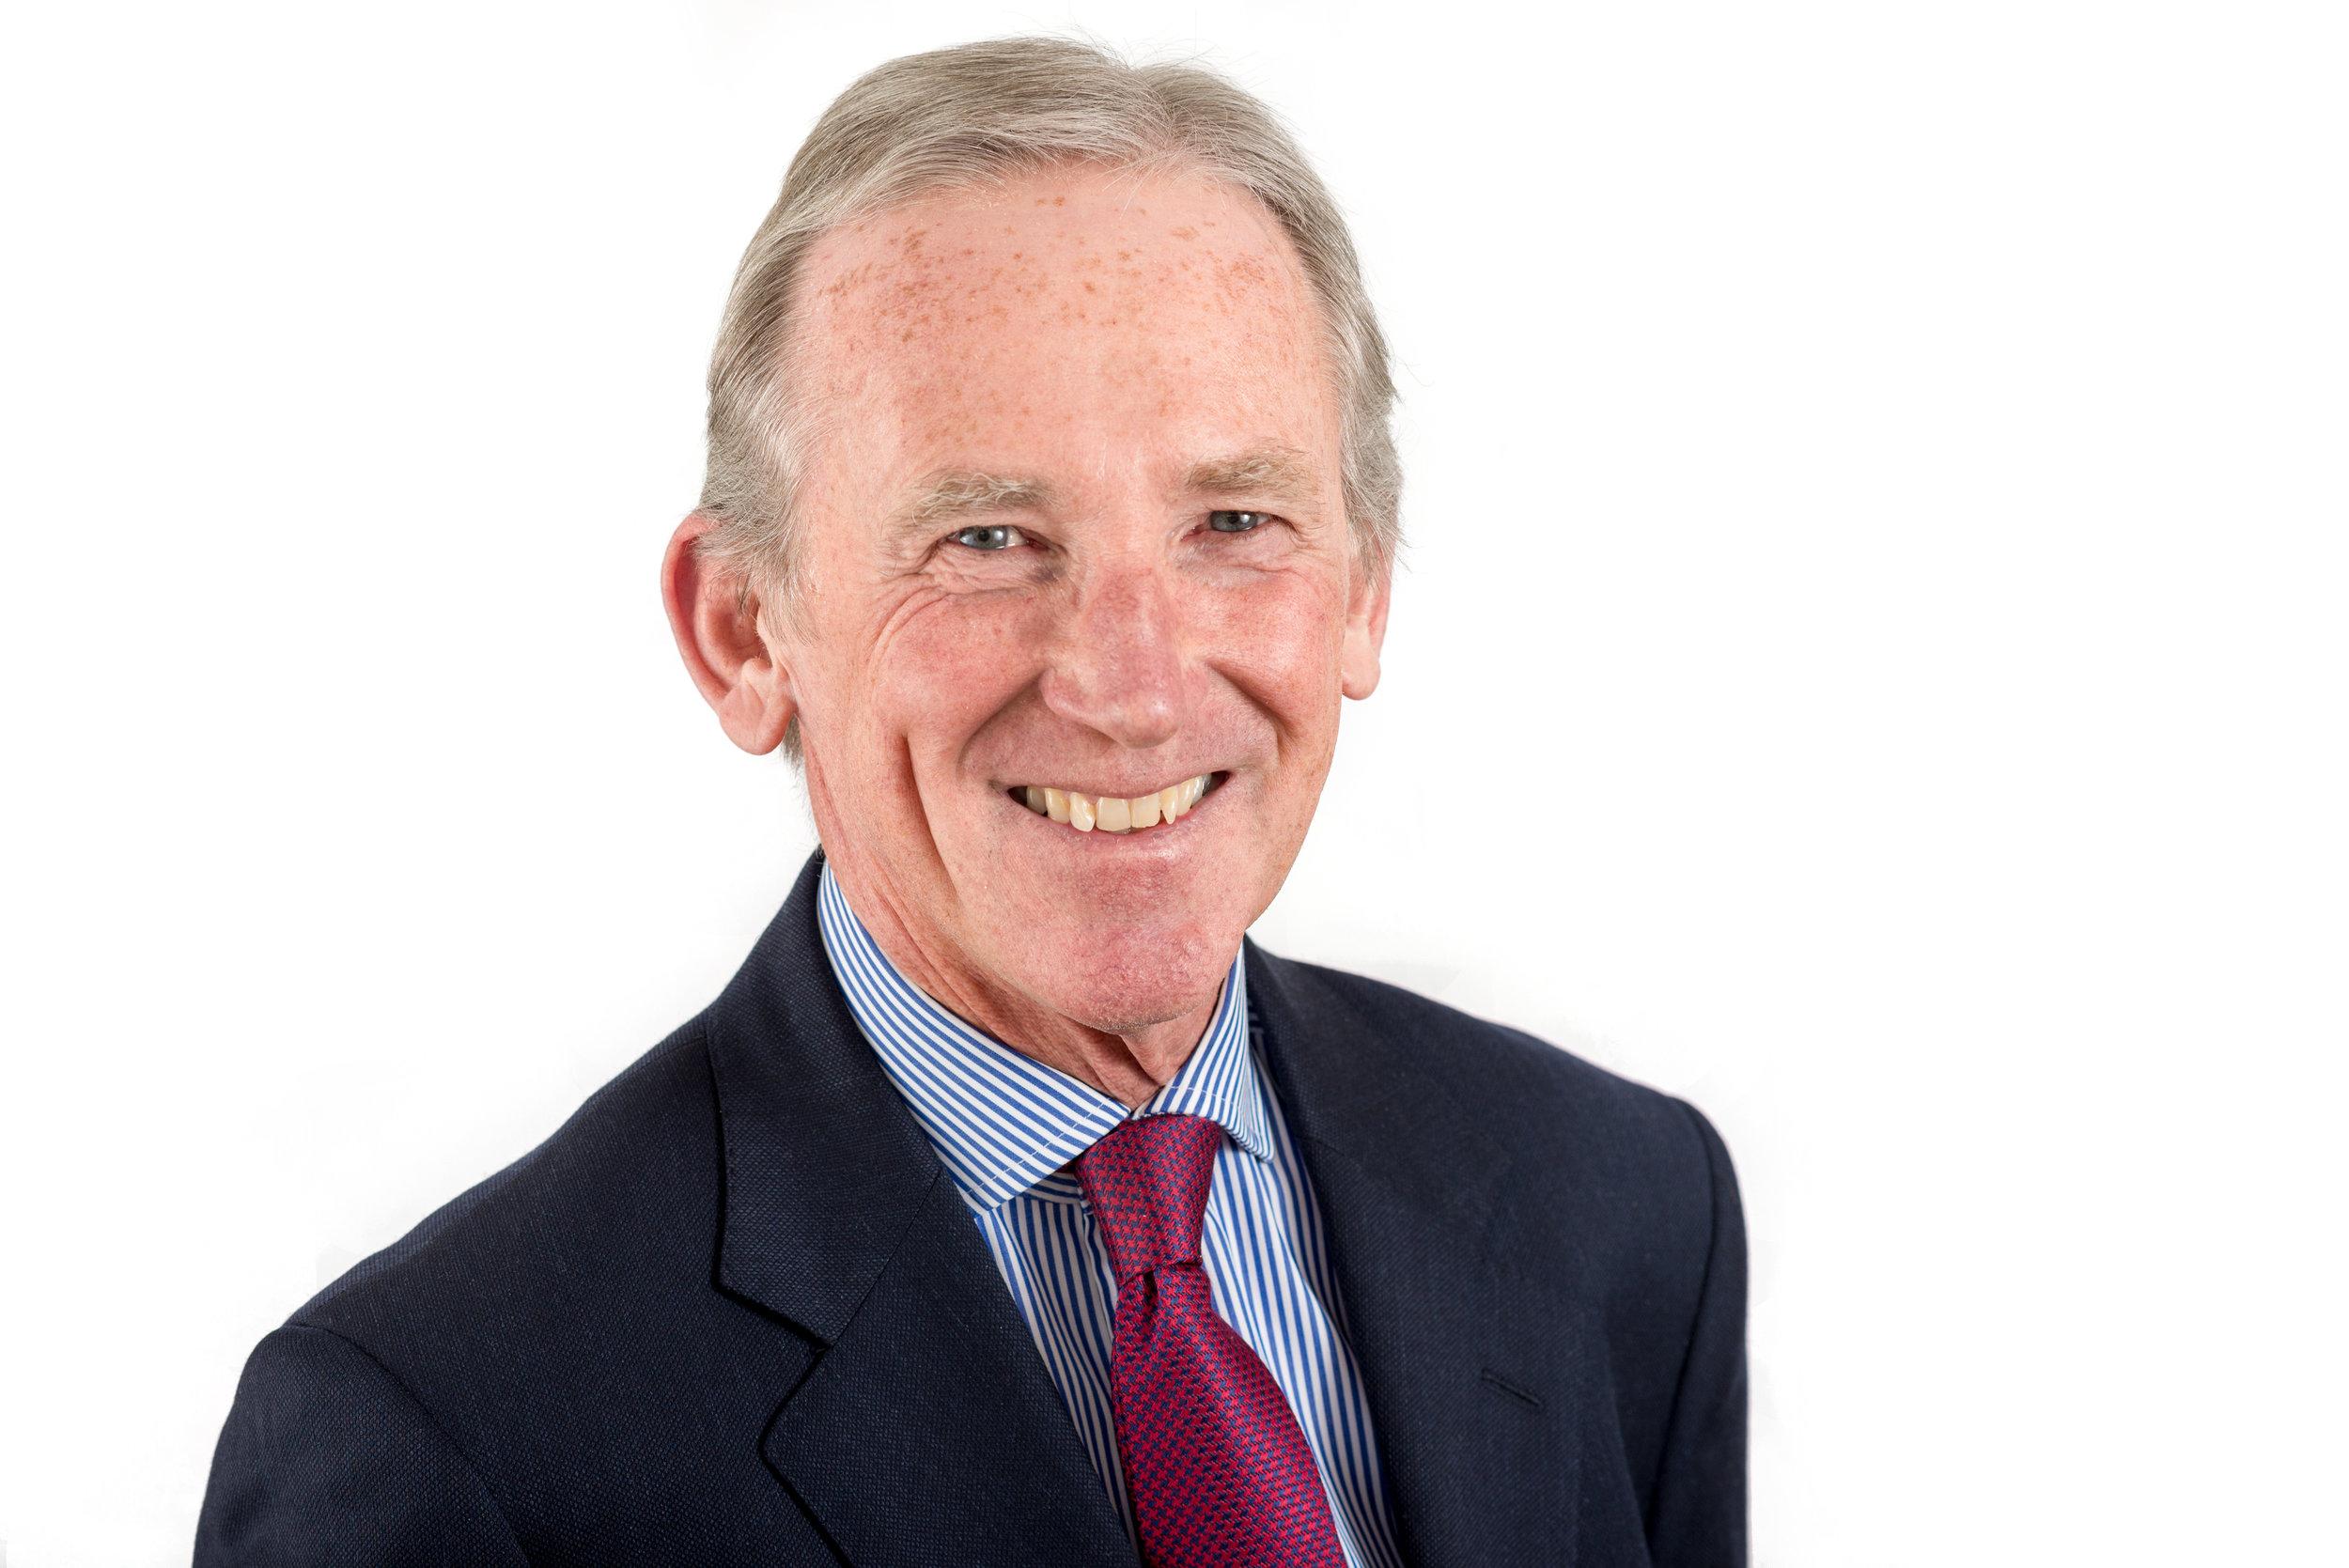 Businessman Headshot Photo Wearing blue Jacket and claret tie